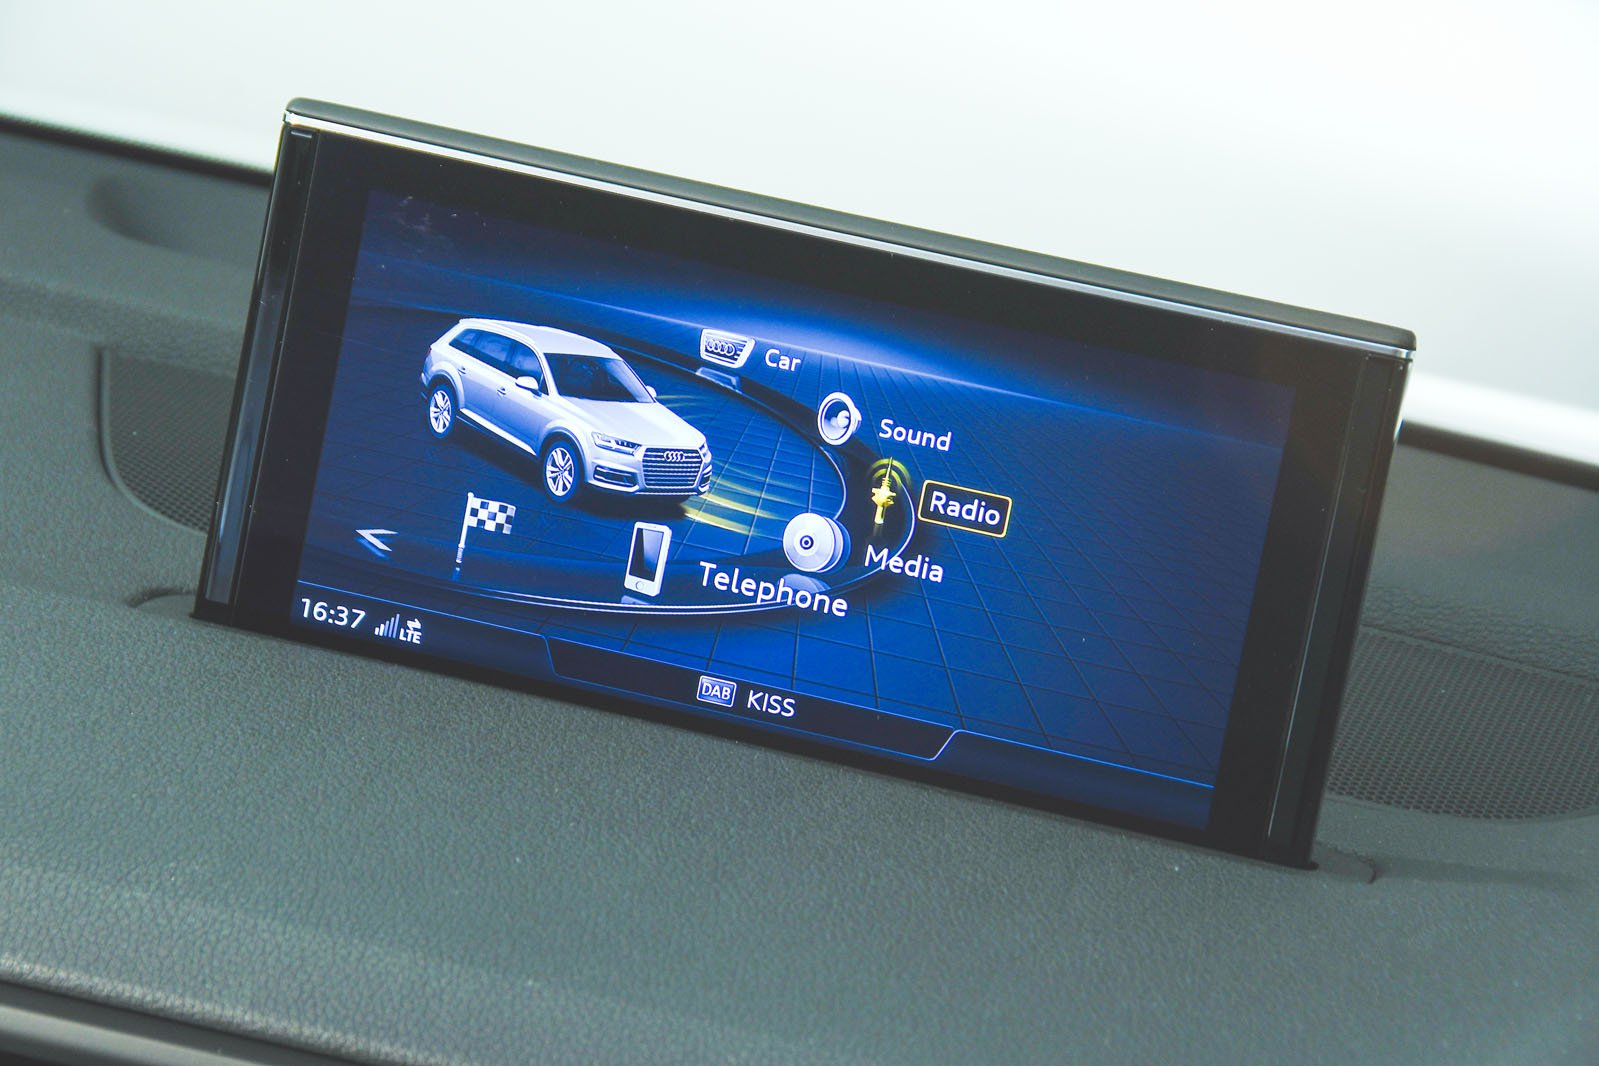 Audi Q7 infotainment